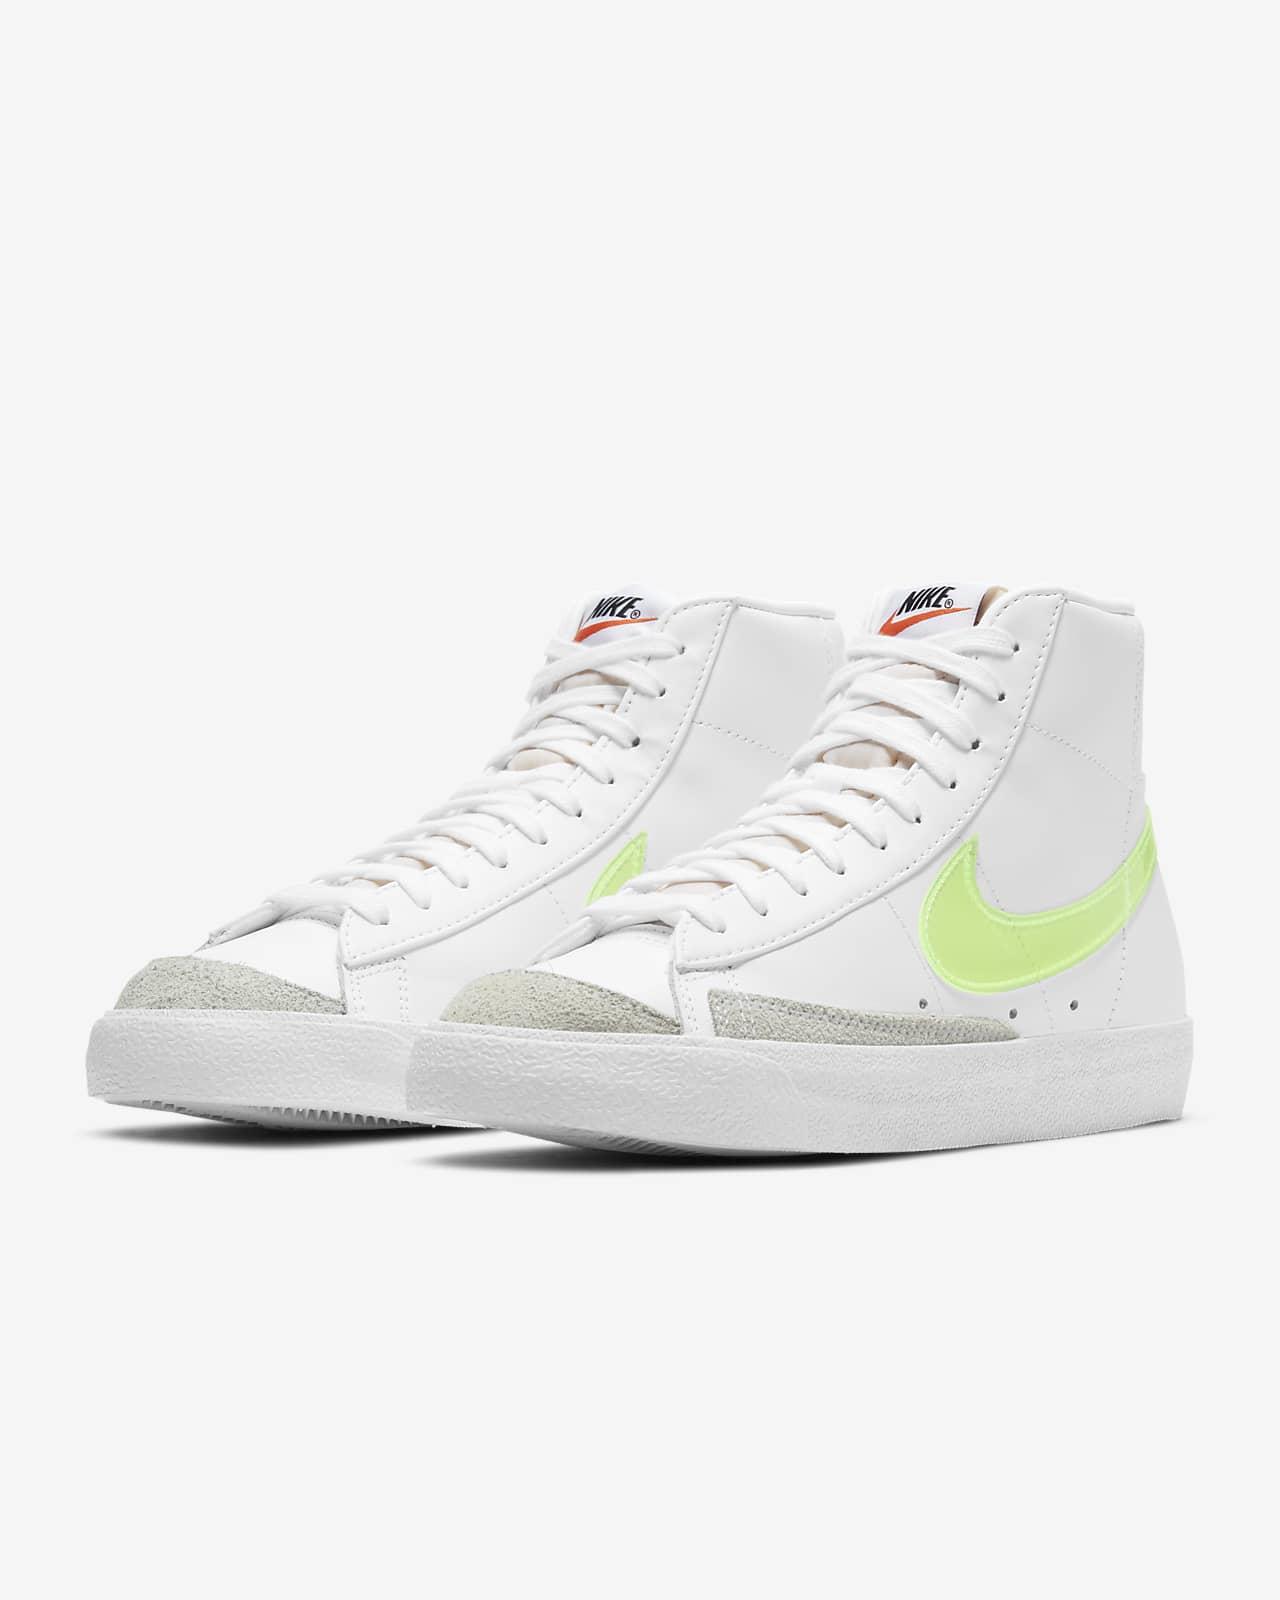 Chaussure Nike Blazer Mid '77 Essential pour Femme. Nike LU